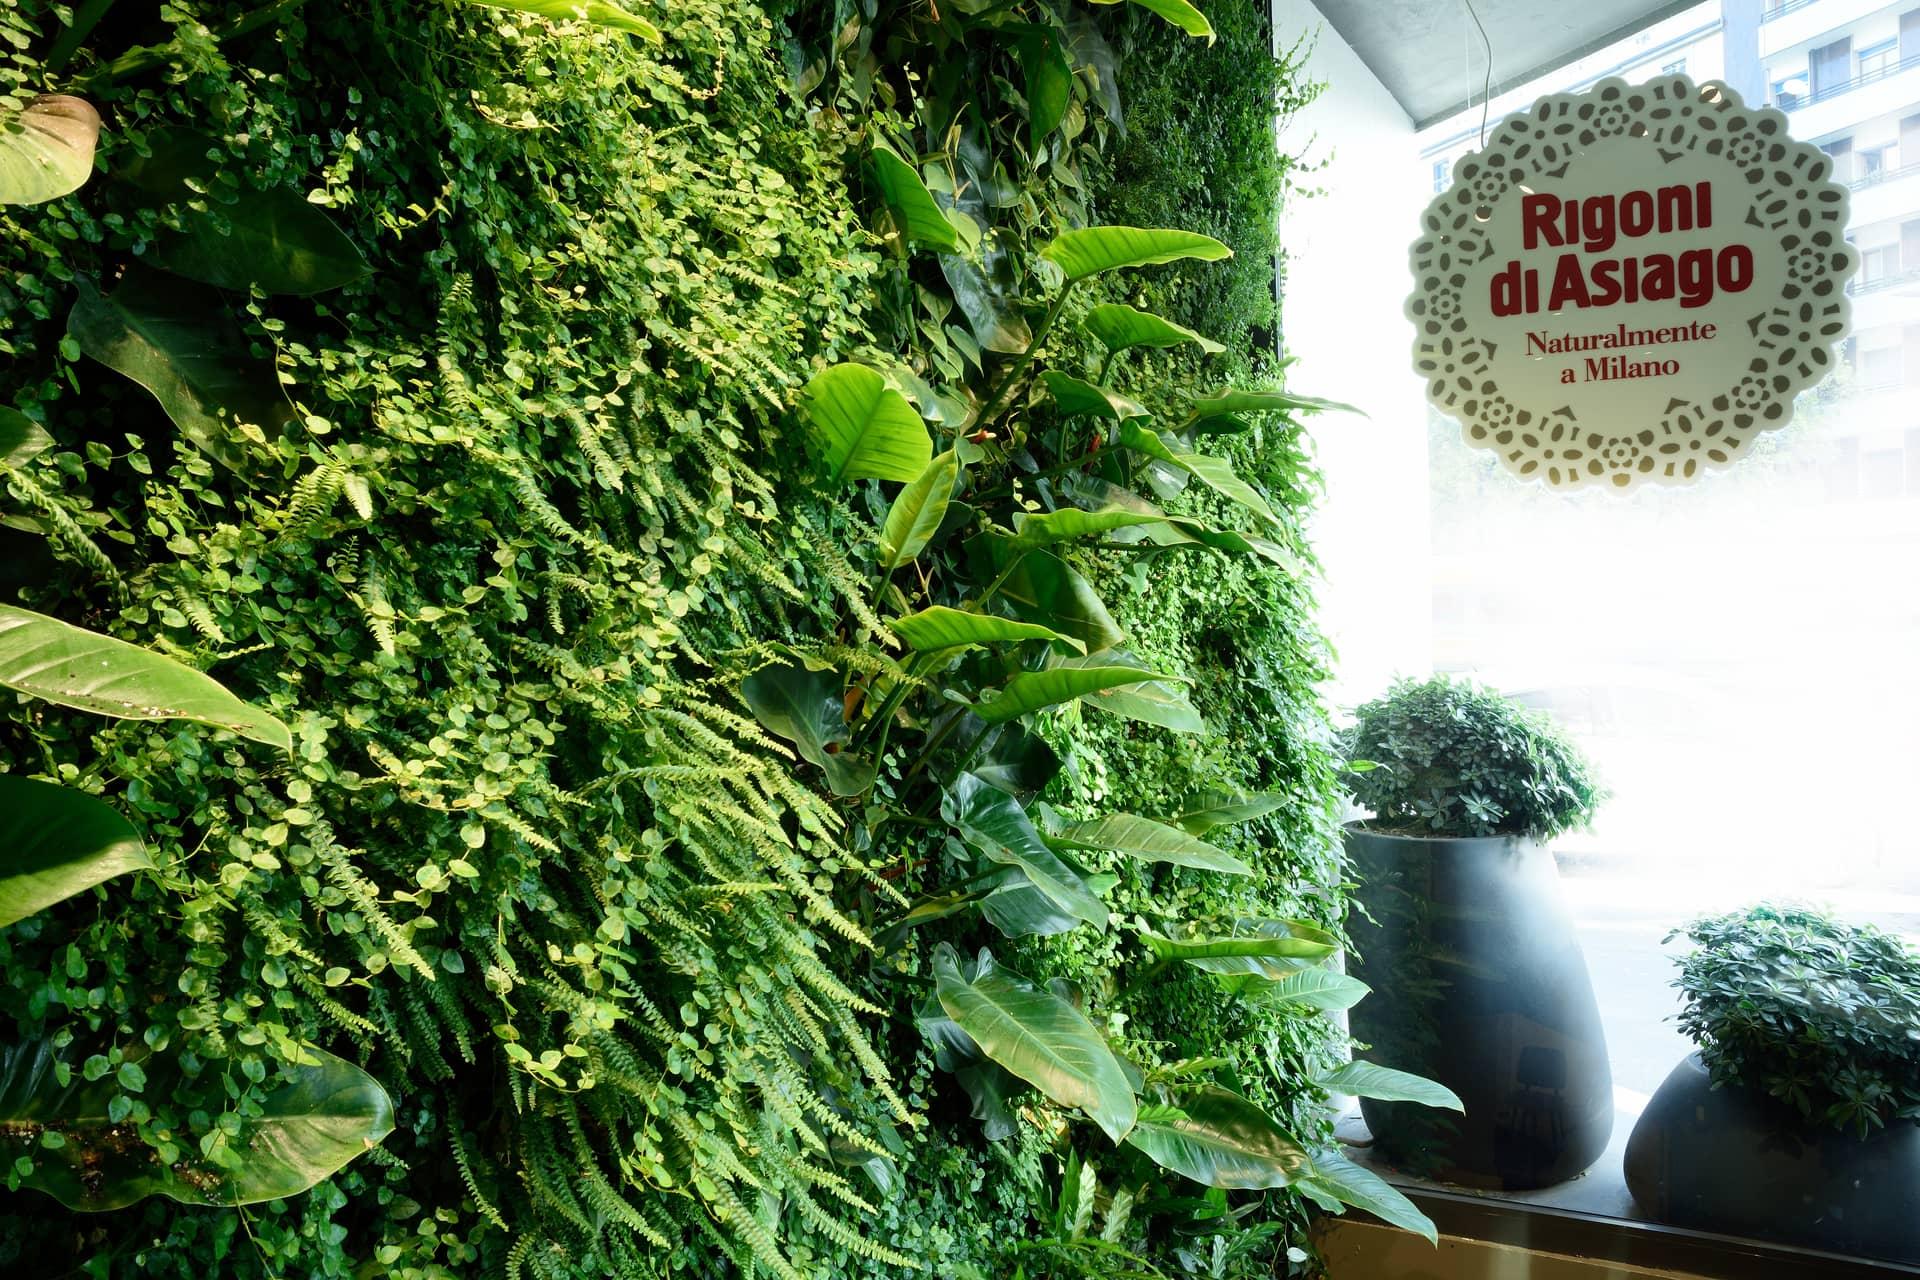 Giardini verticali rigoni di asiago divomi design vivo for Giardini verticali milano